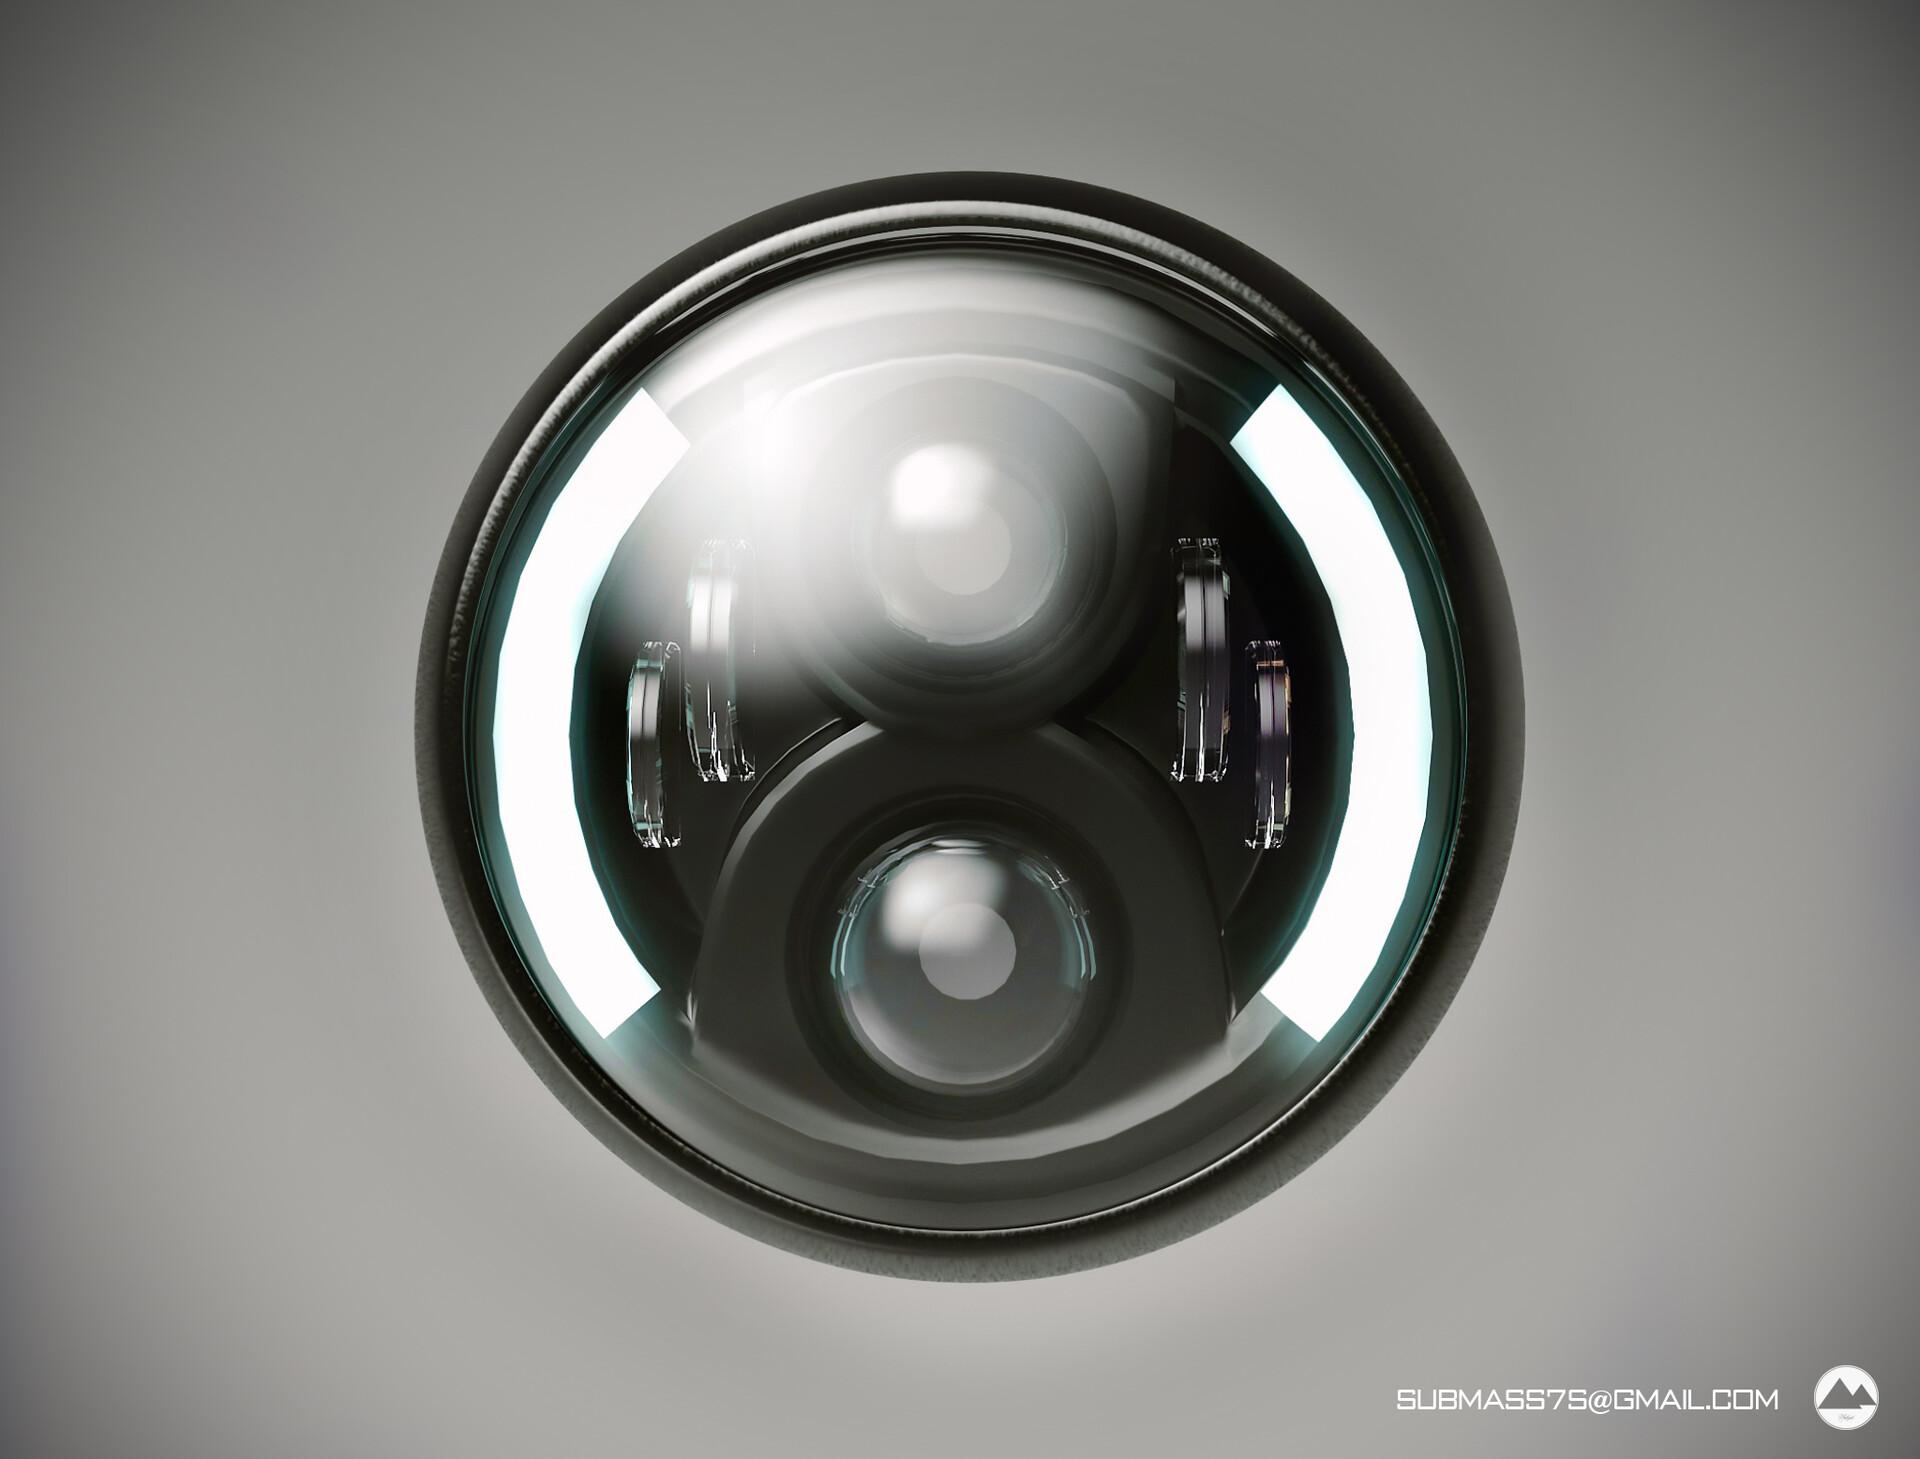 7 inch led headlight, Сергей Миронов - ArtStation